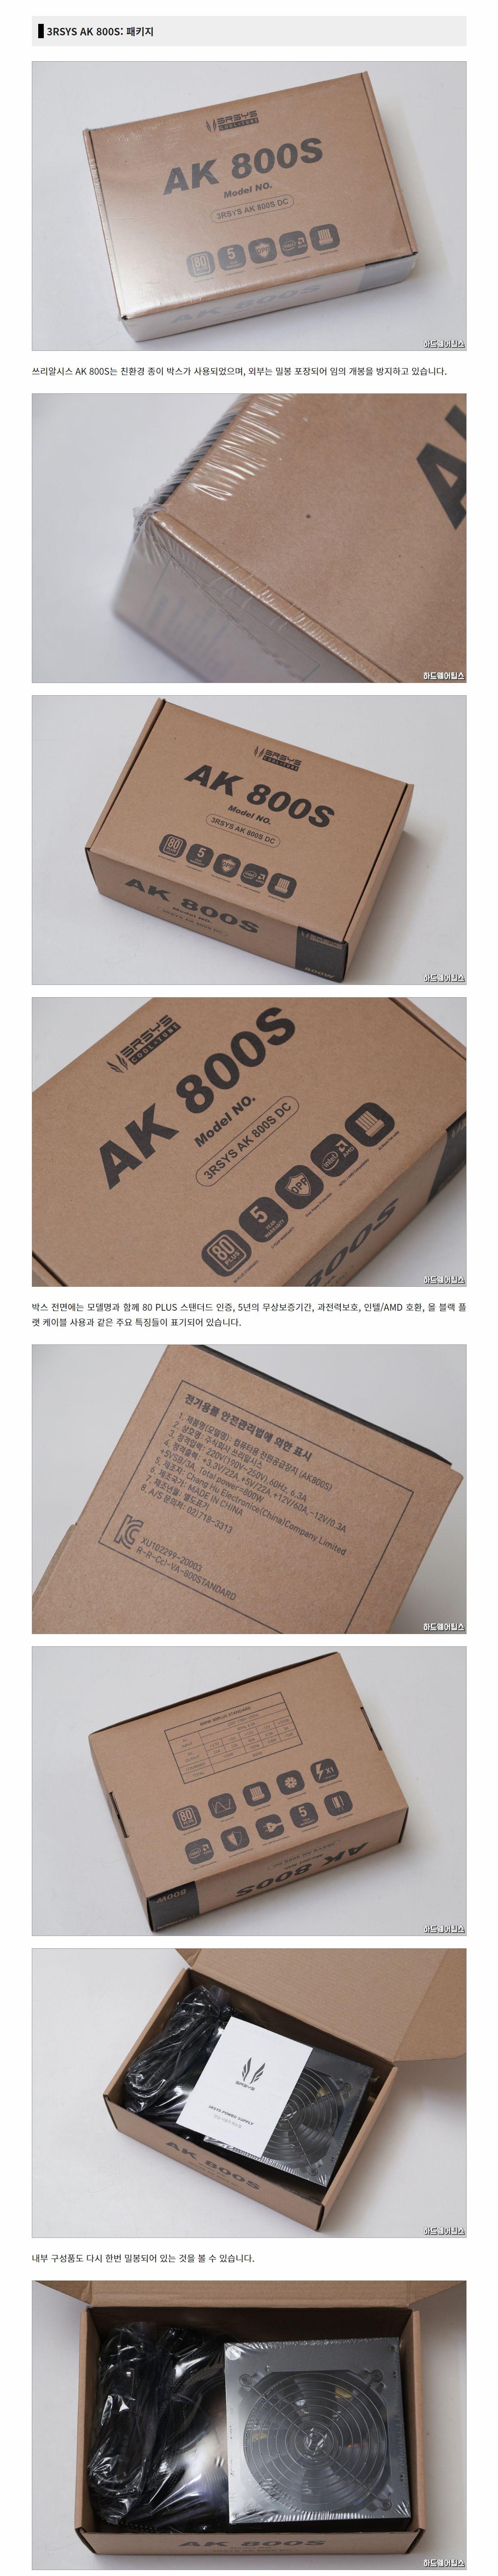 3- 3RSYS AK 800S 80 PLUS STANDARD 230V EU.jpg